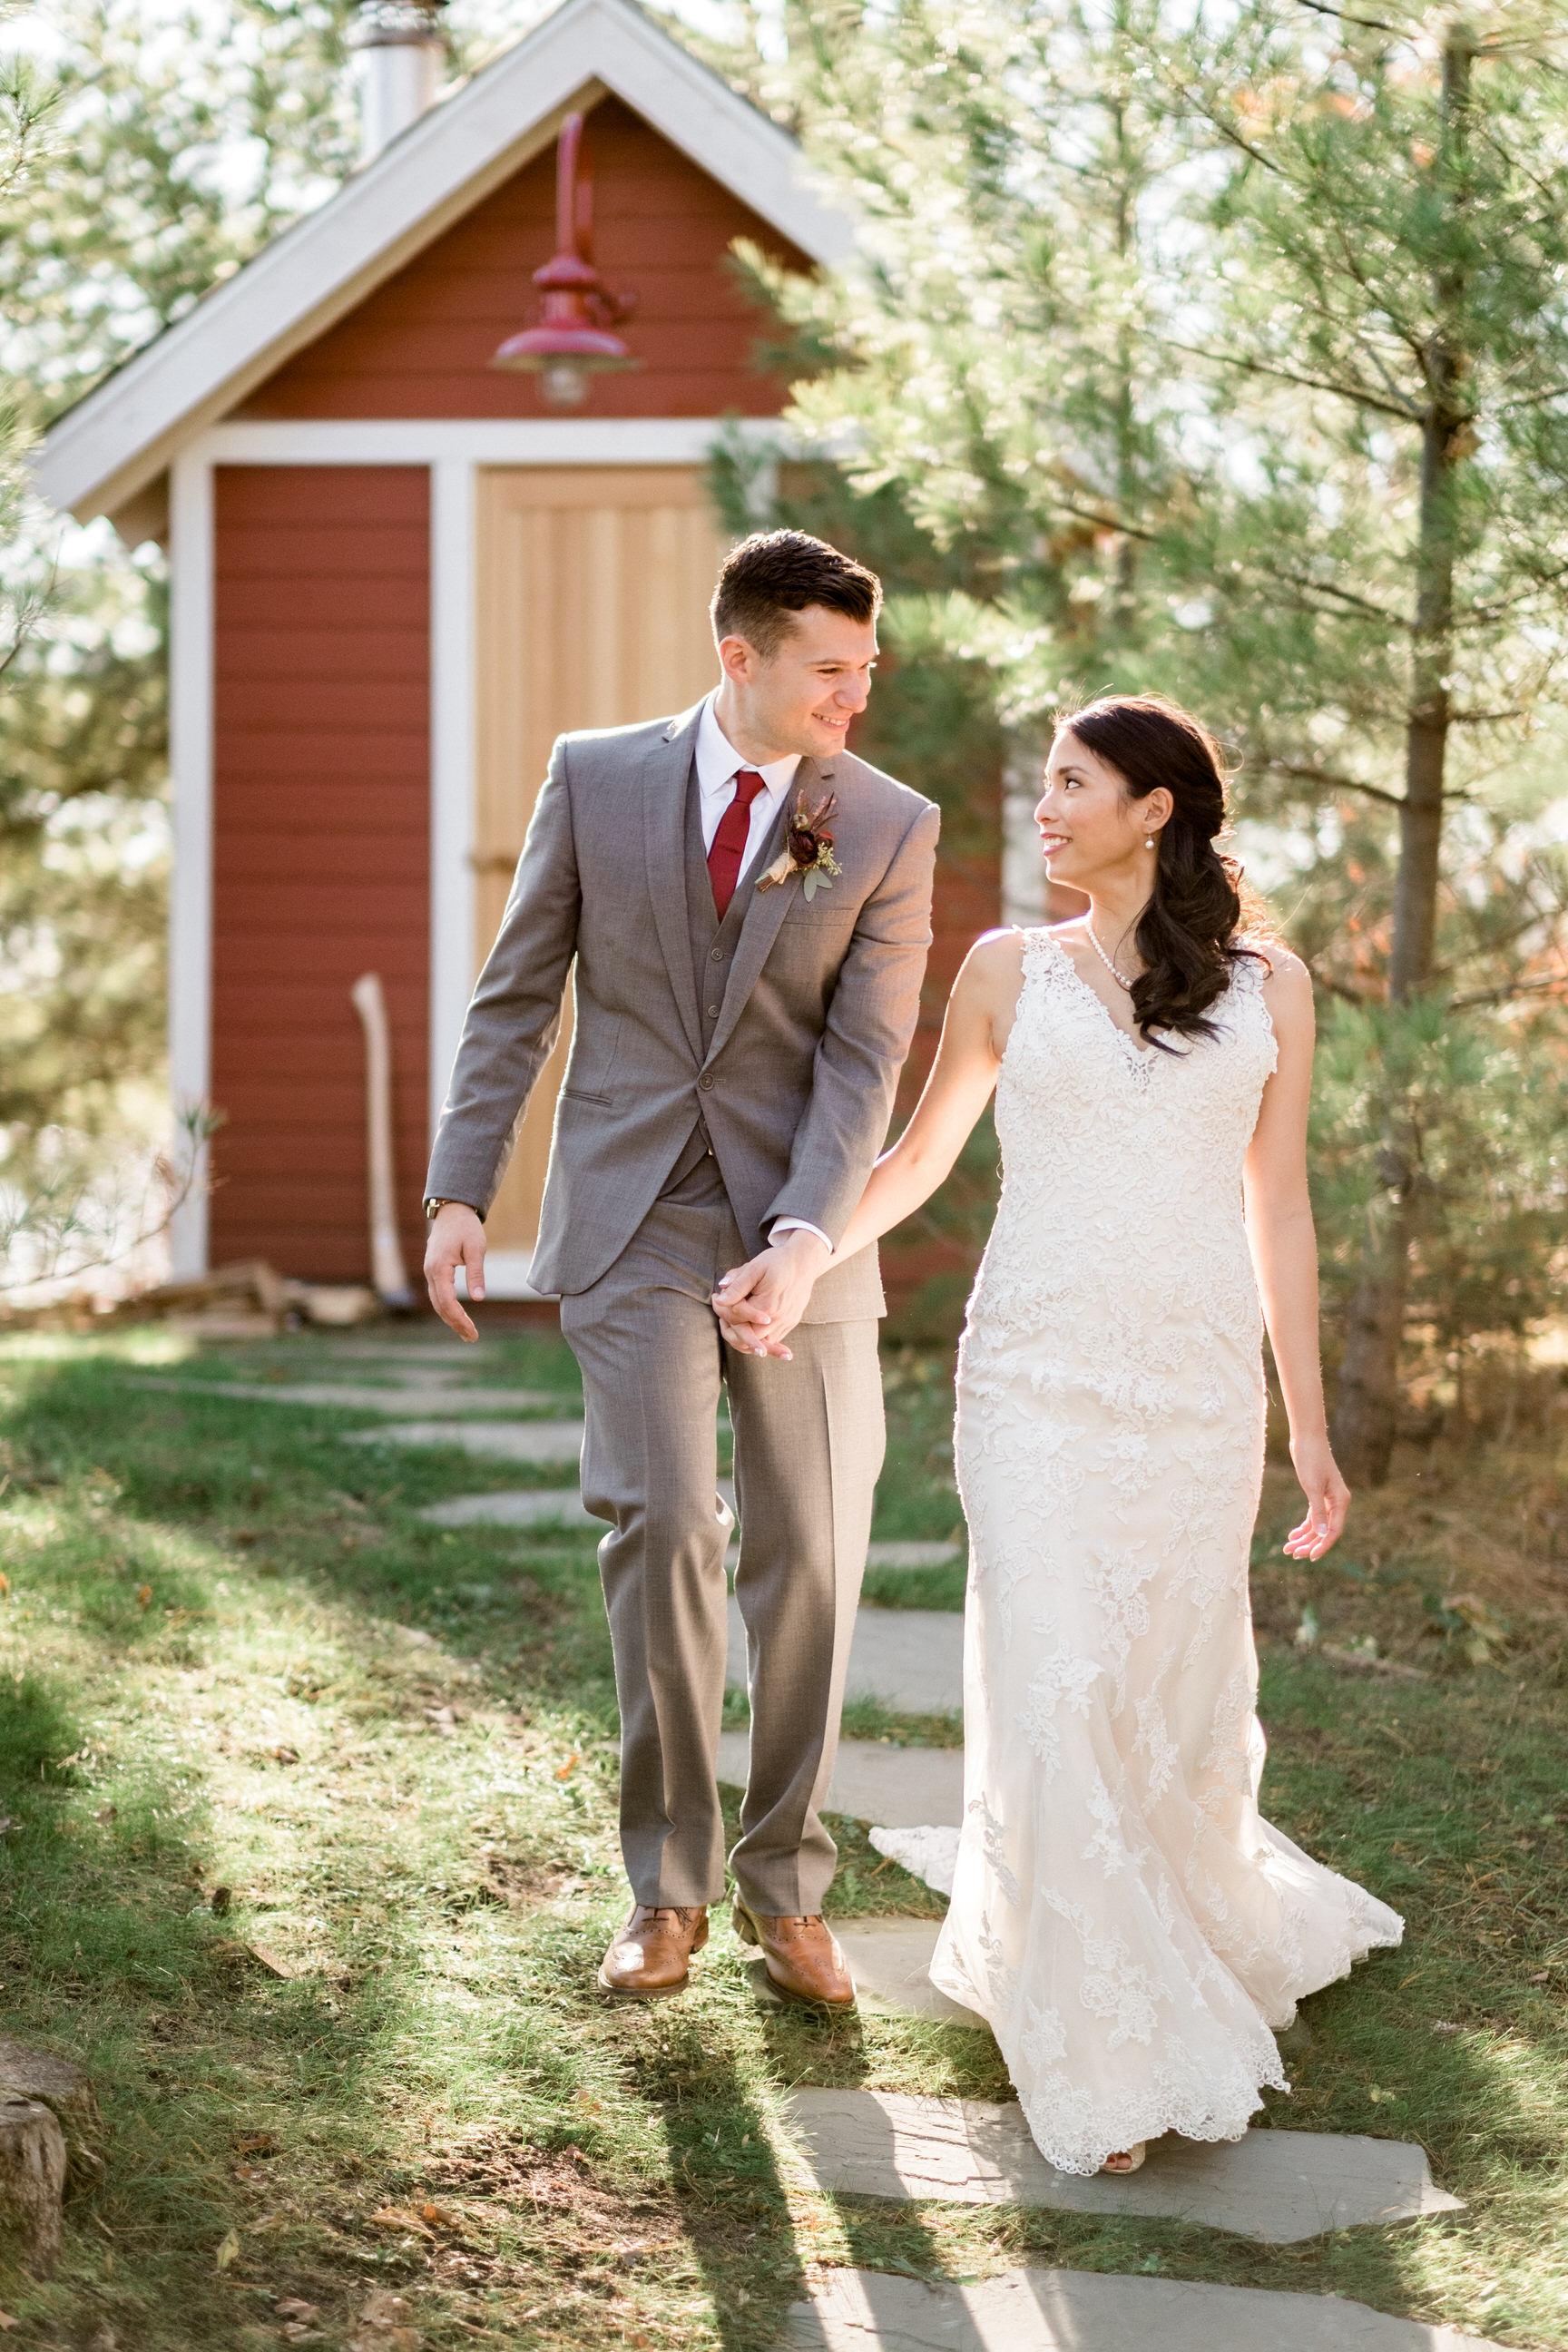 northern, mn barn wedding